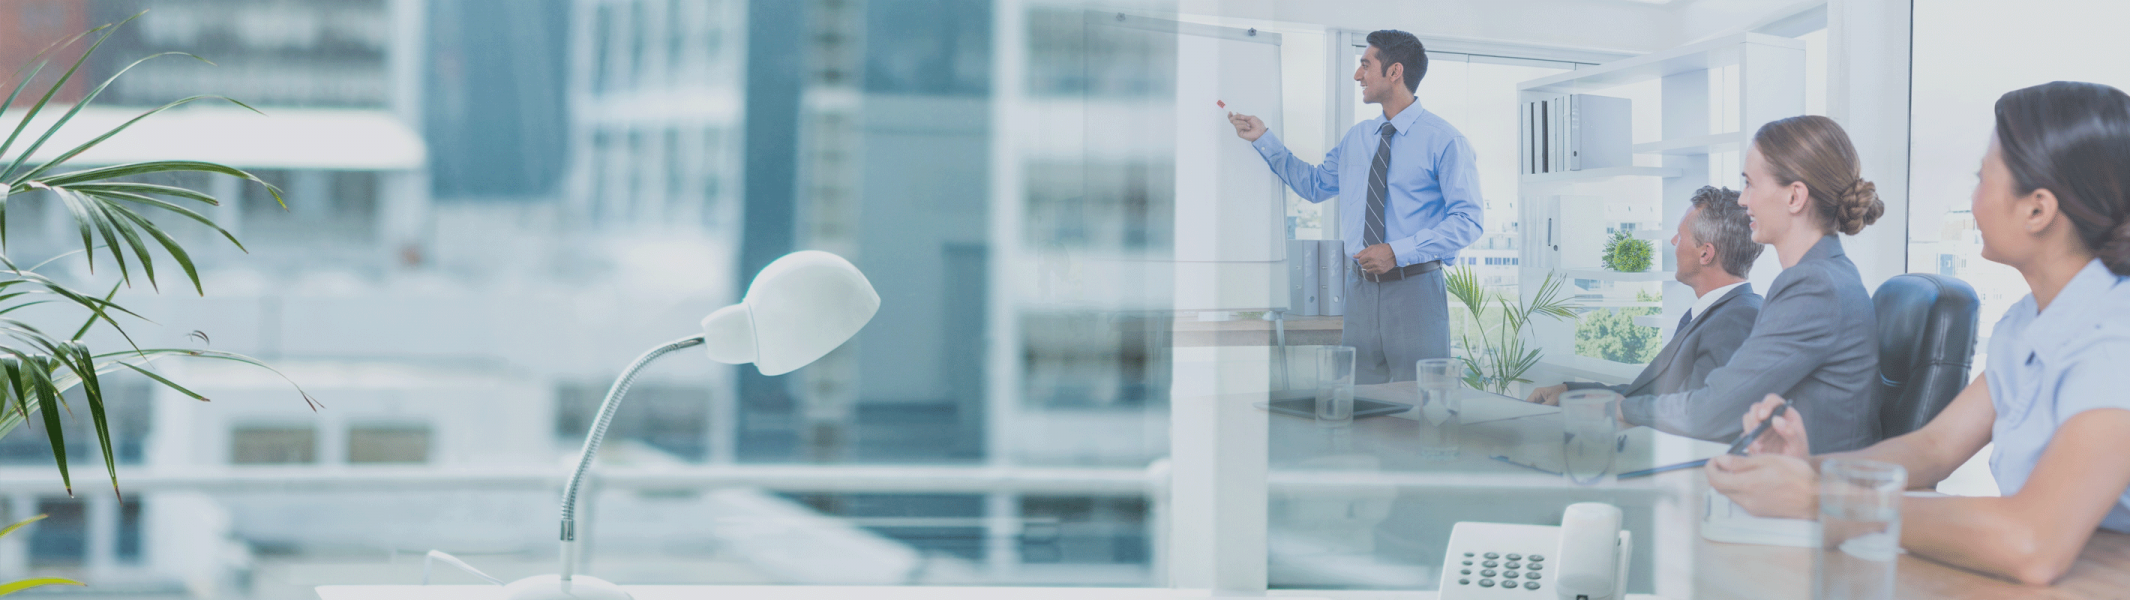 Why choose Strategi Compliance